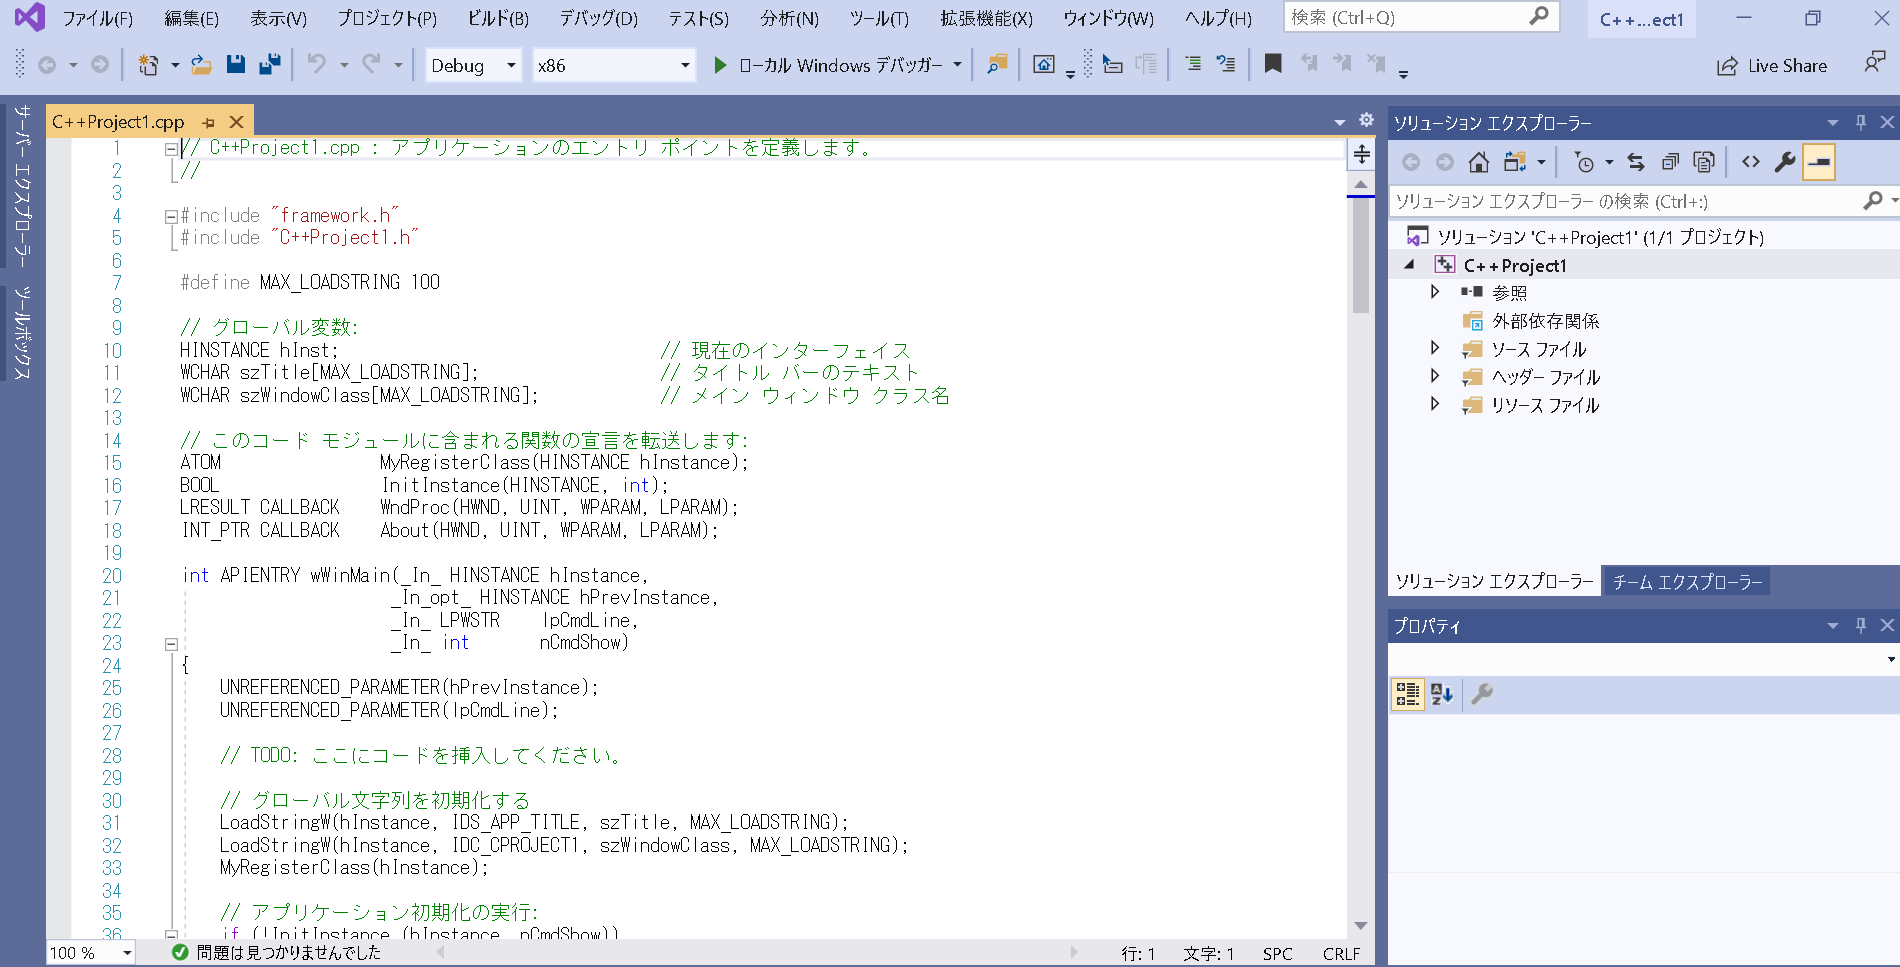 C++プロジェクト